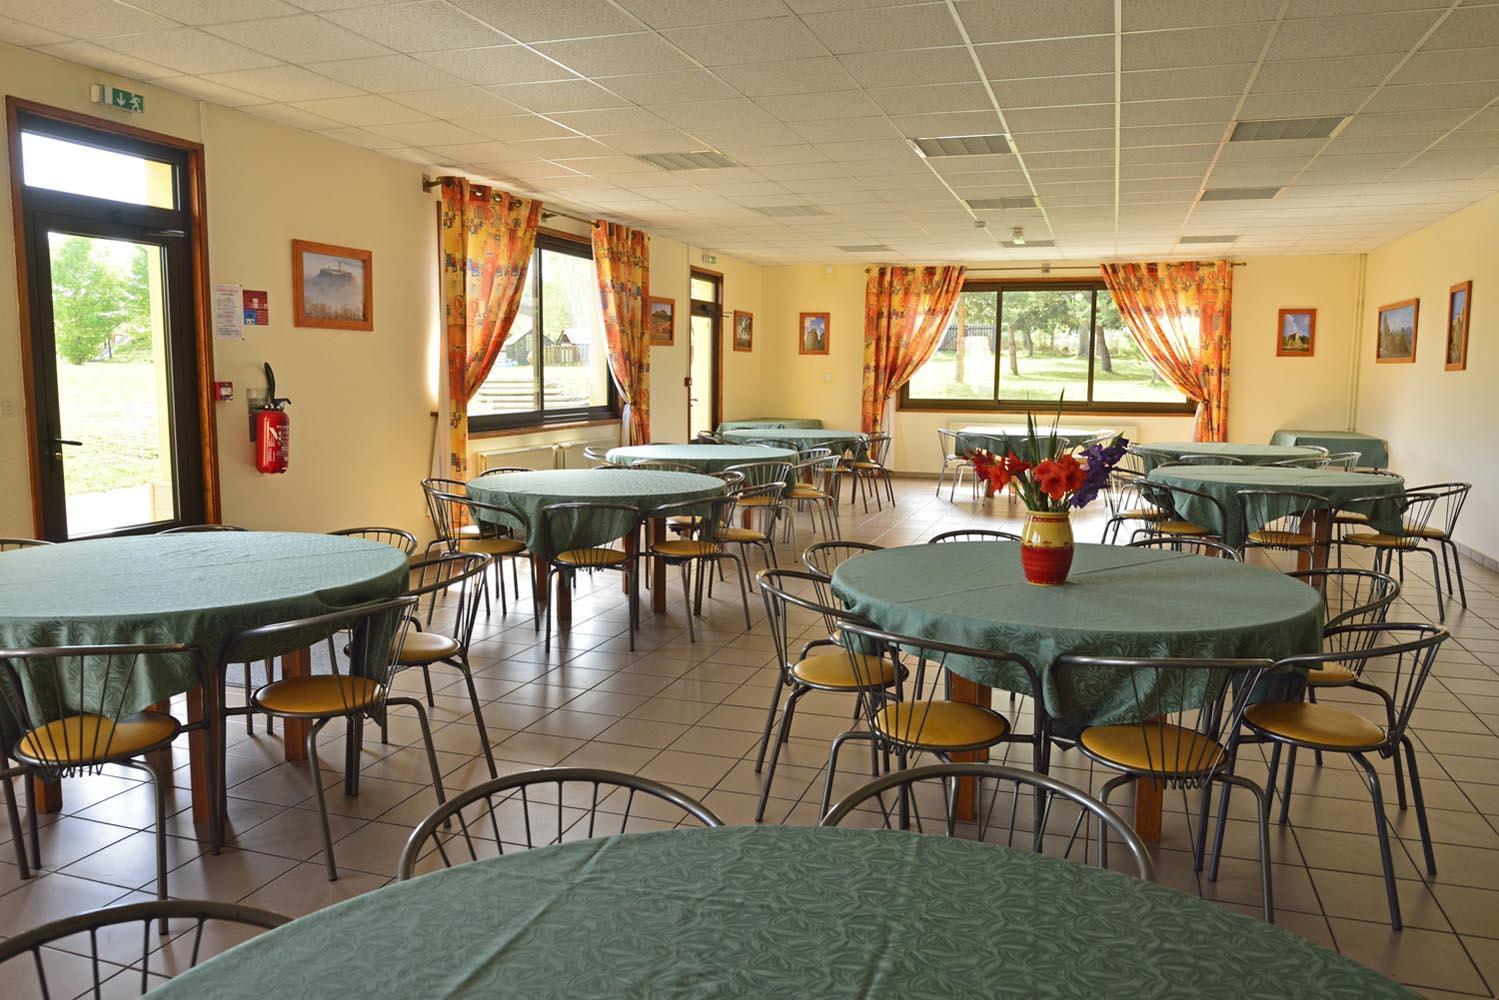 Vacances c libataires domaine de chadenac for Salle a manger vilvoorde restaurant